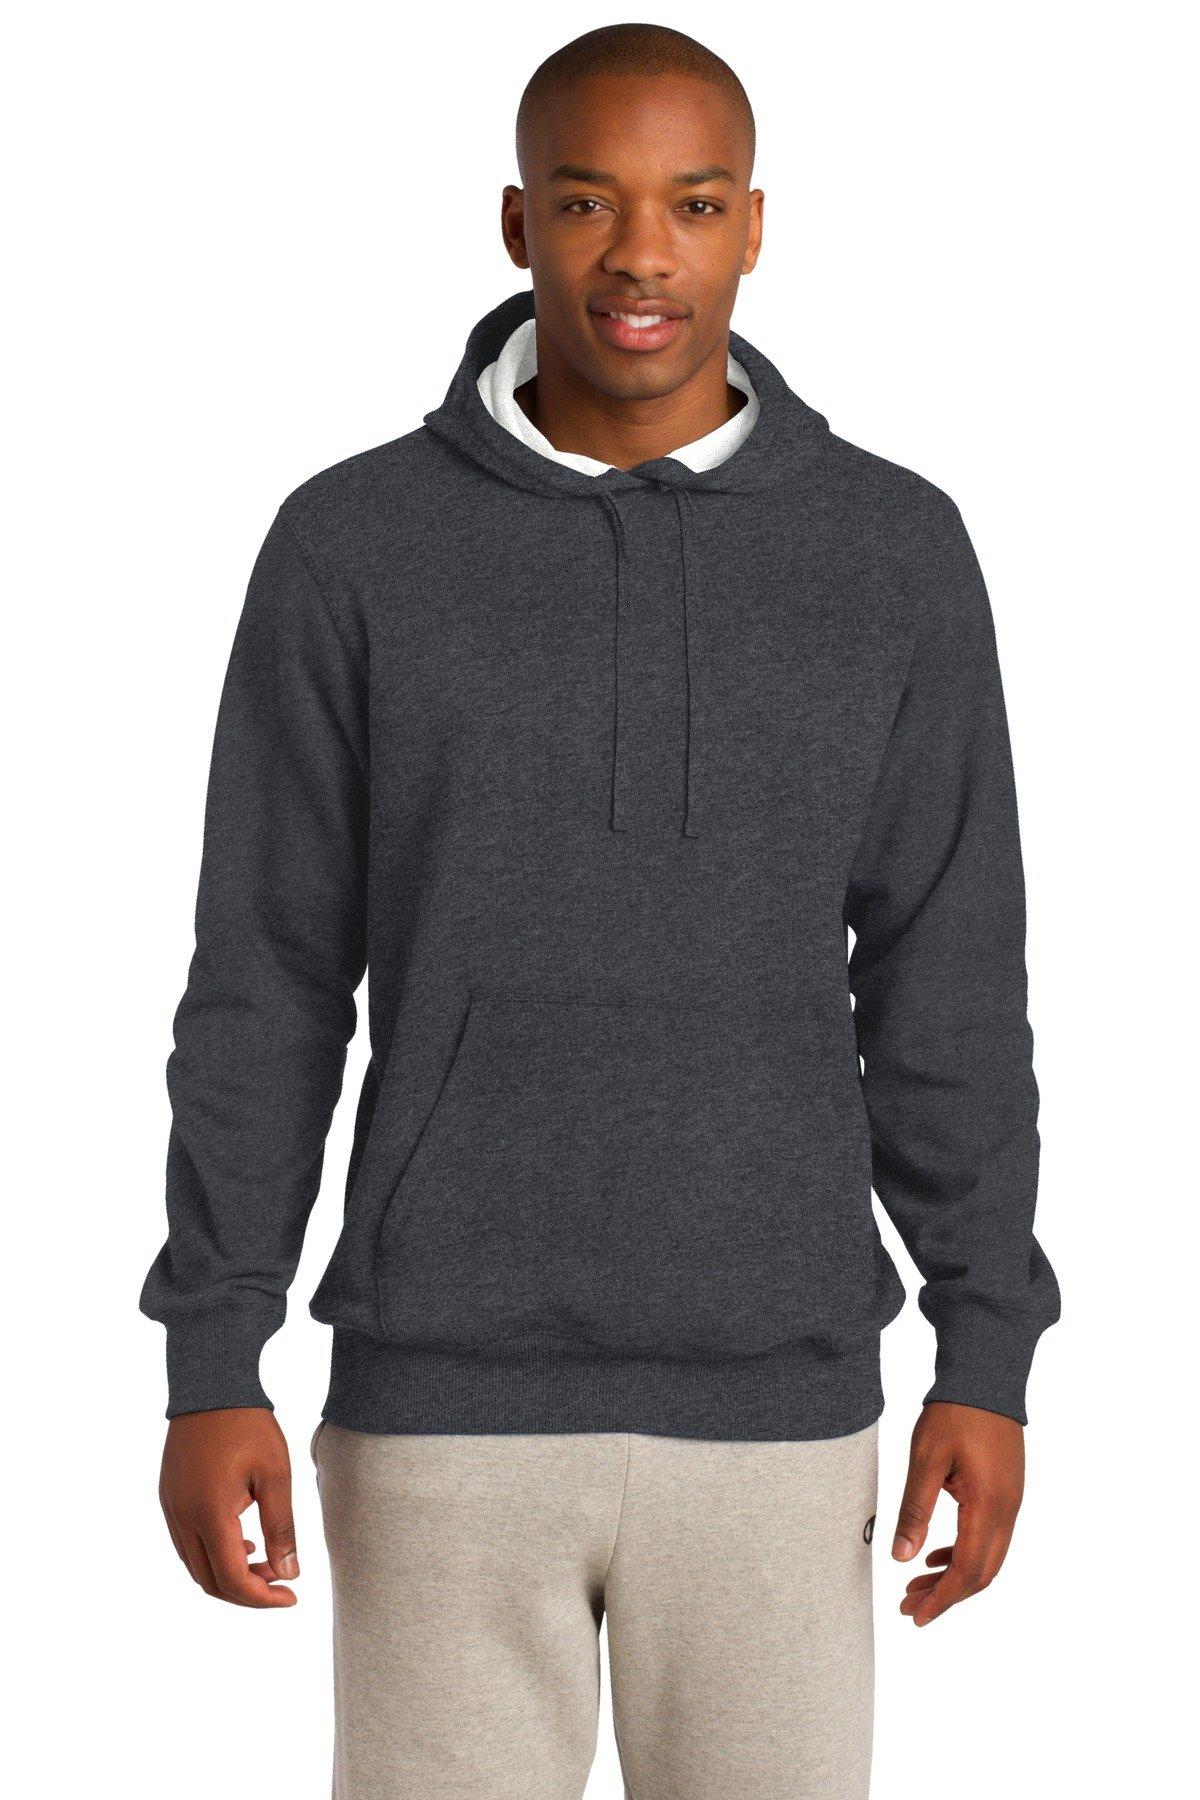 Sport-Tek Tall Pullover Hooded Sweatshirt. 3XLT Graphite Hthr by Sport-Tek